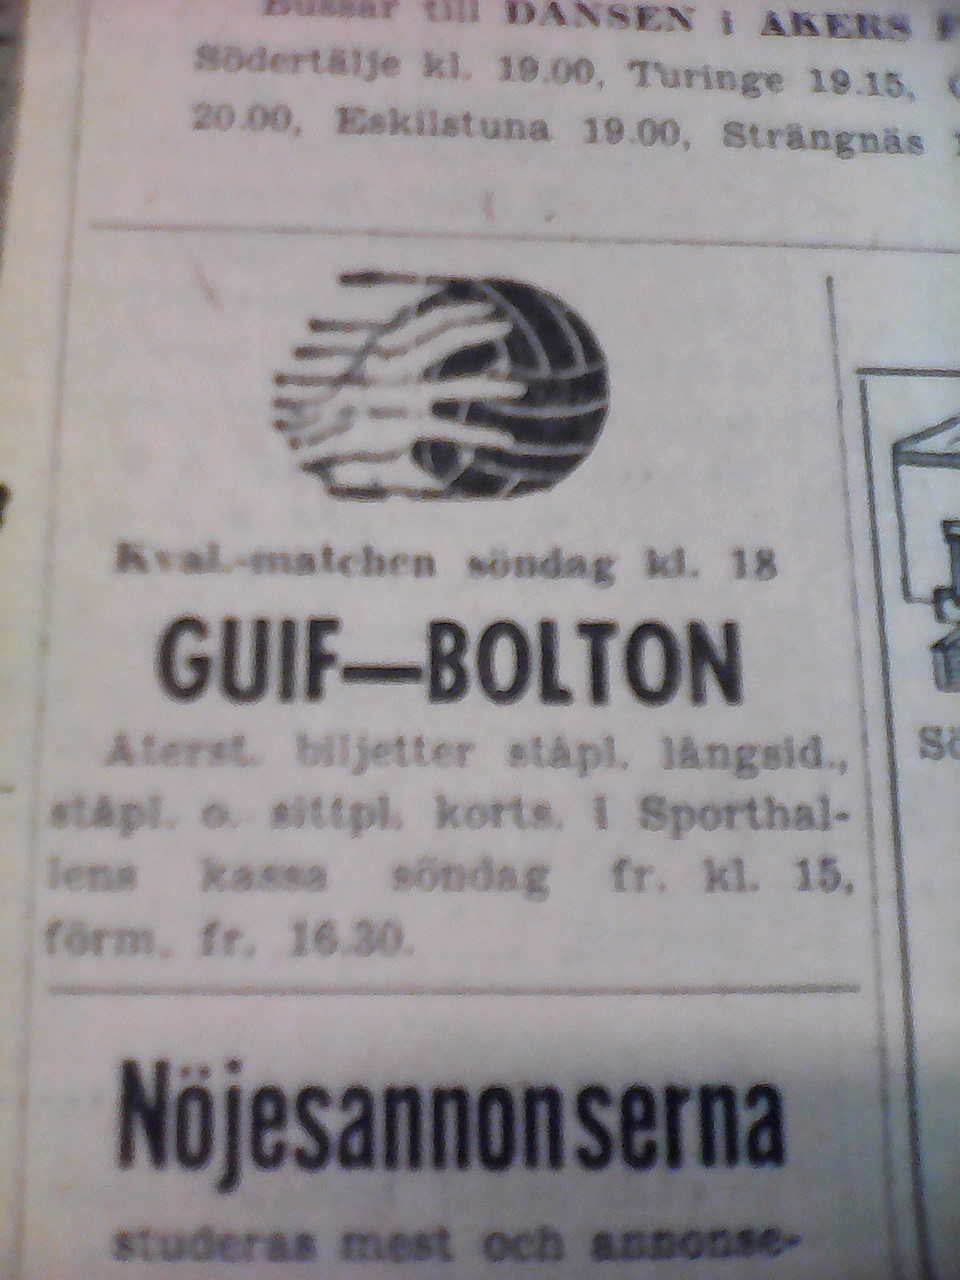 Matchannons Guif-Bolton